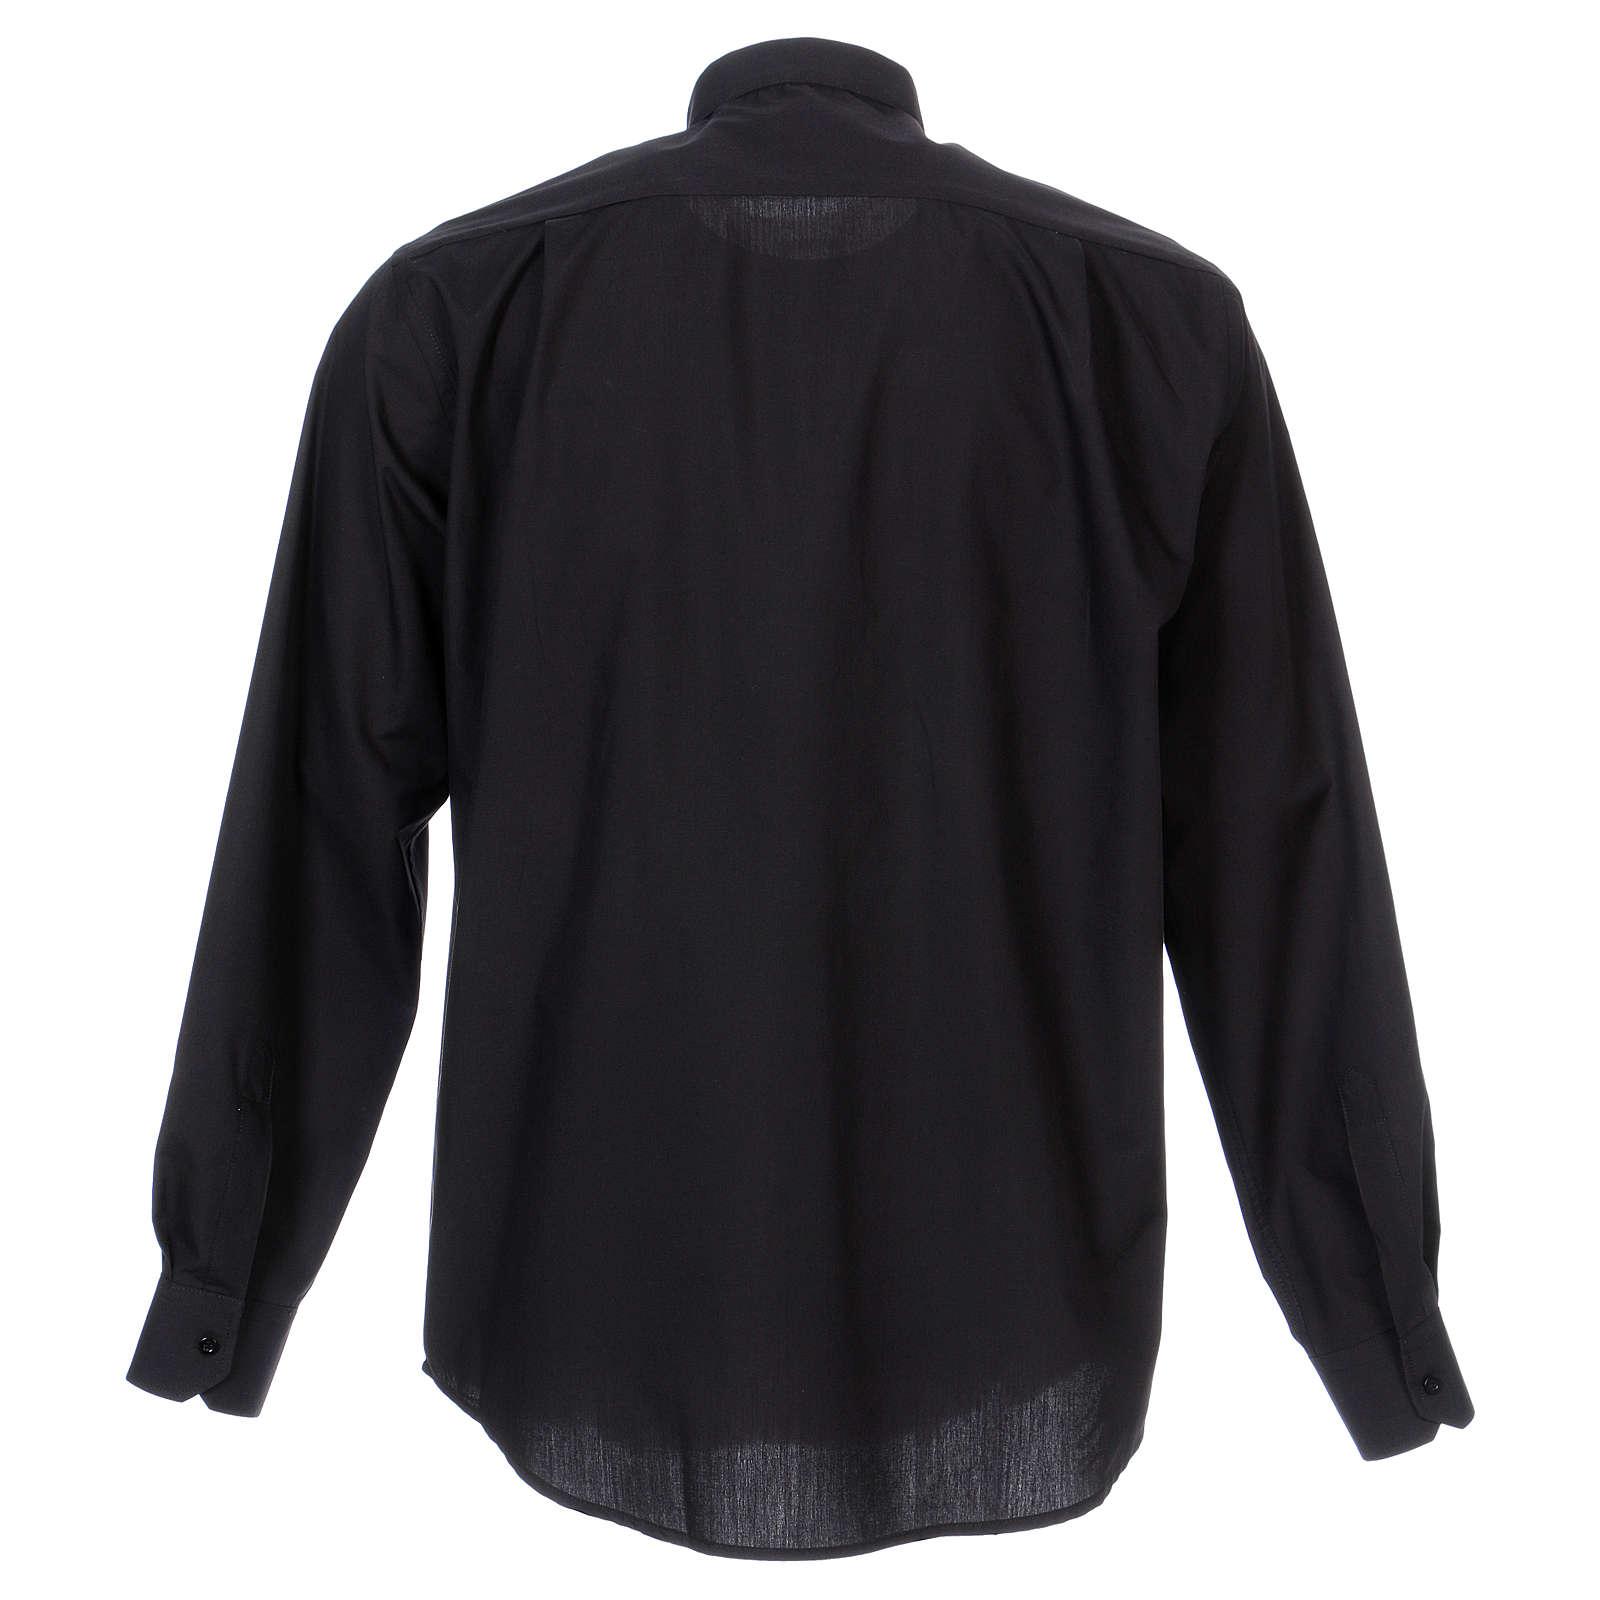 Camisa clergyman manga larga mixto algodón negra 4